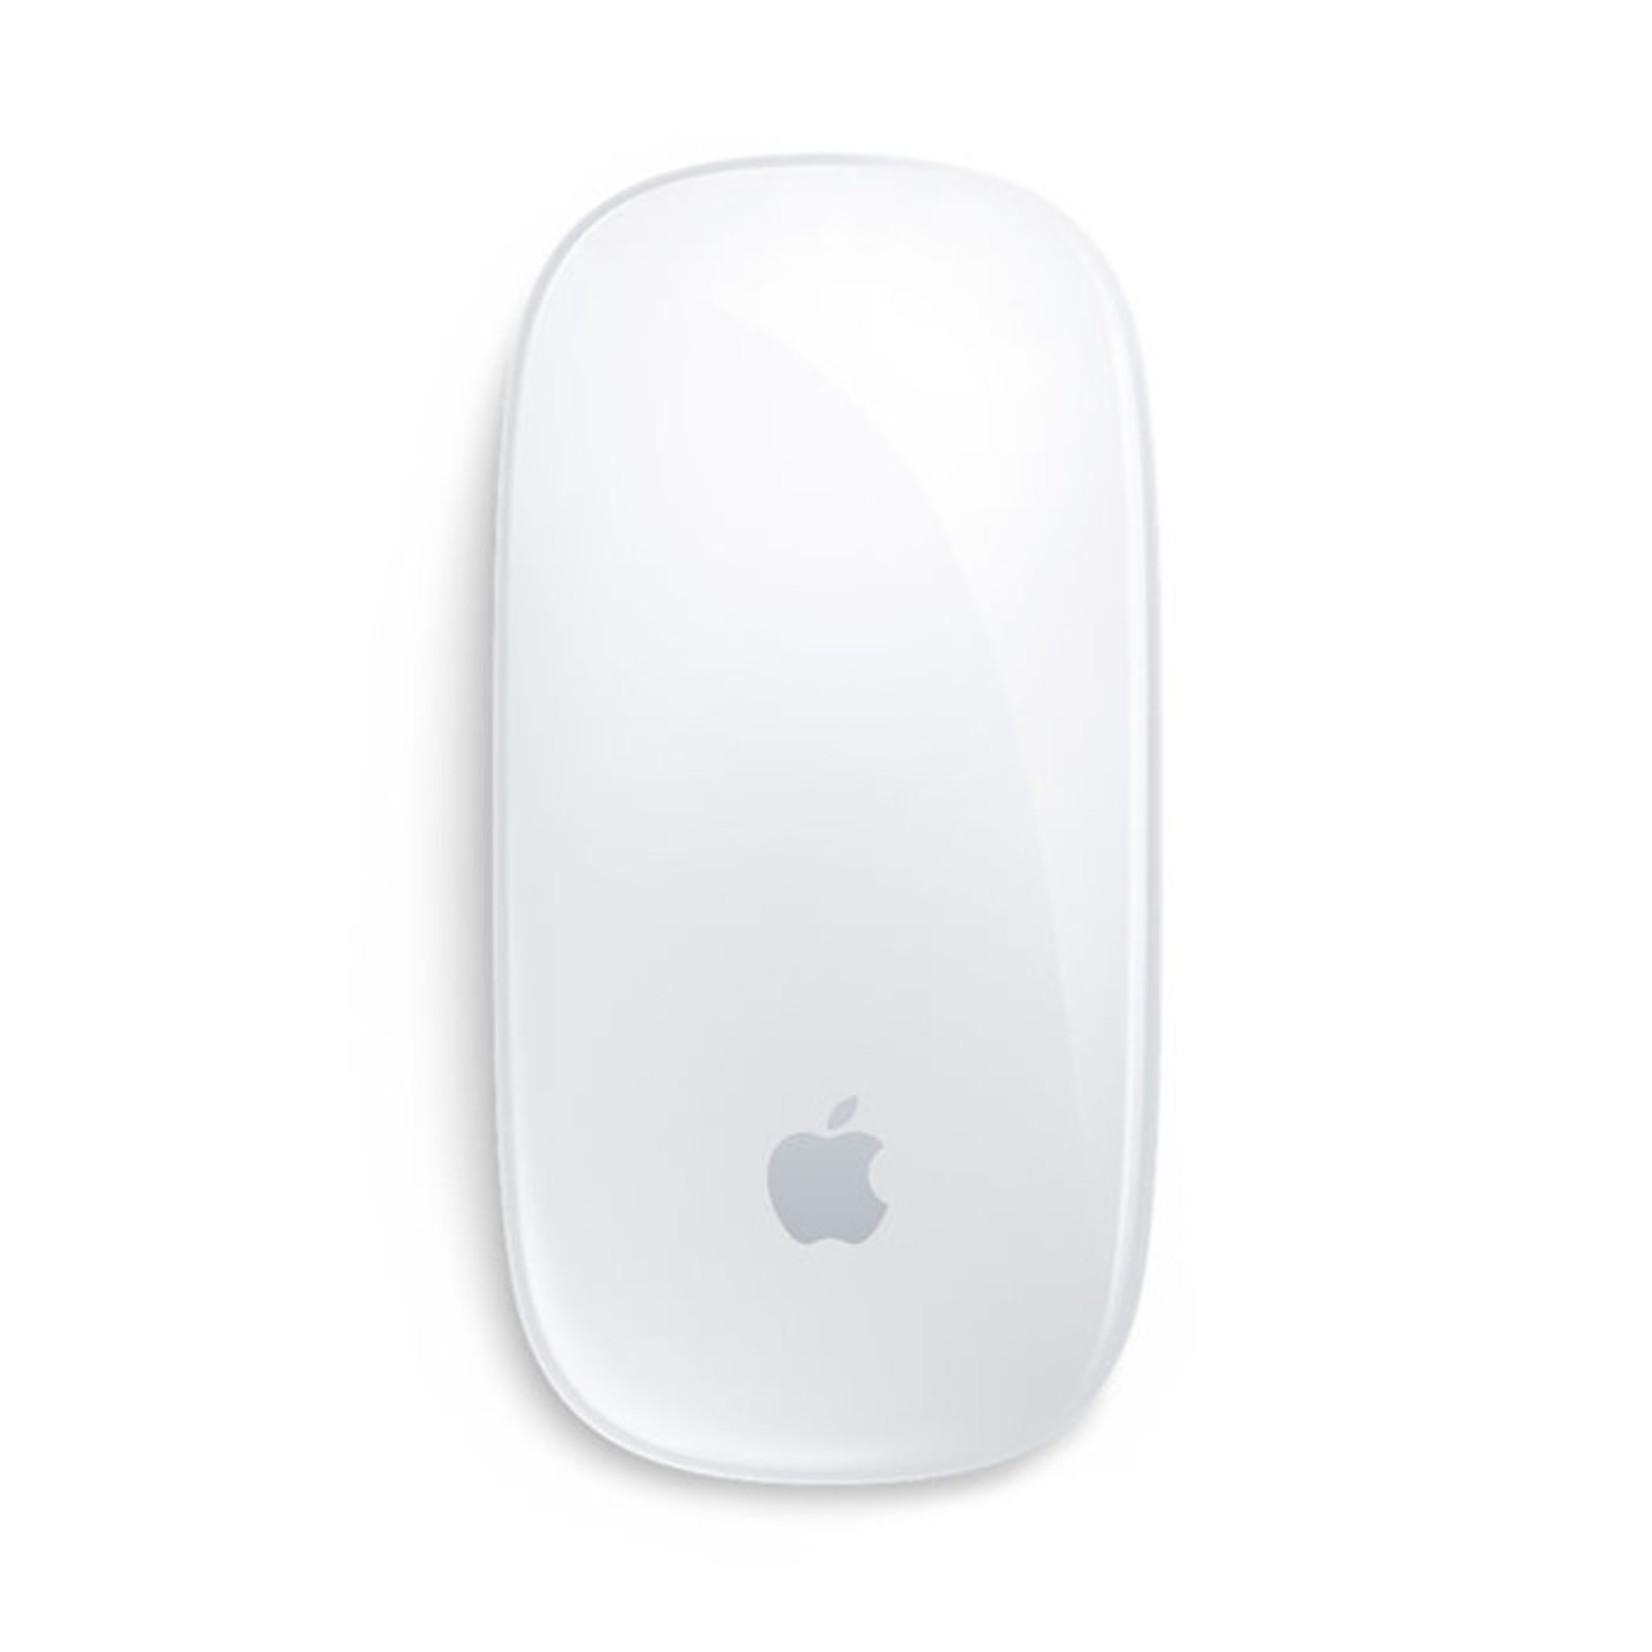 Apple Refurbished Apple Magic Mouse (Draadloos) A1296